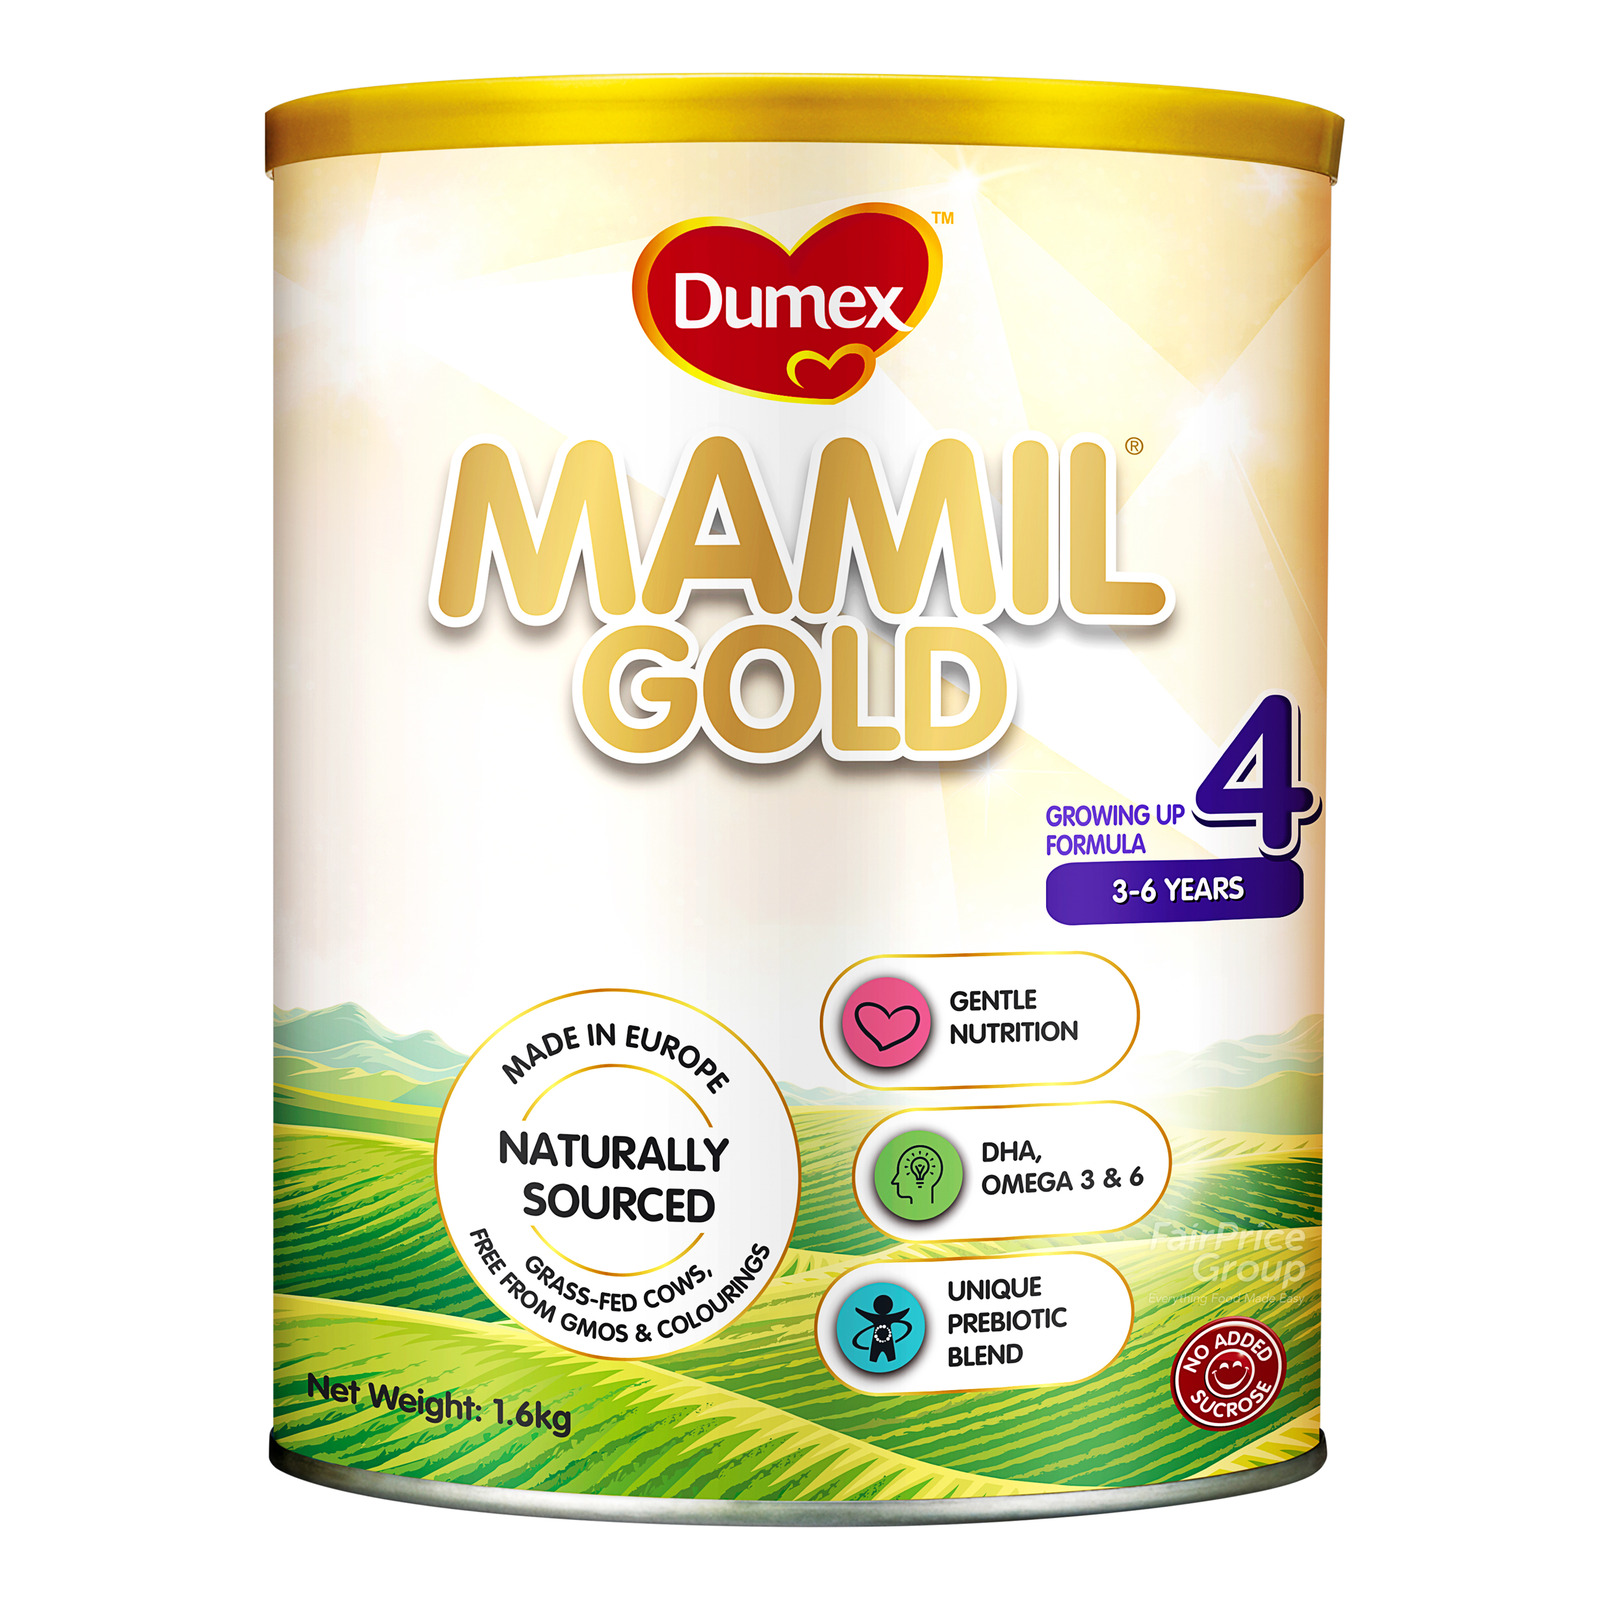 Dumex Mamil Gold Growing Up Milk Formula - Step 4